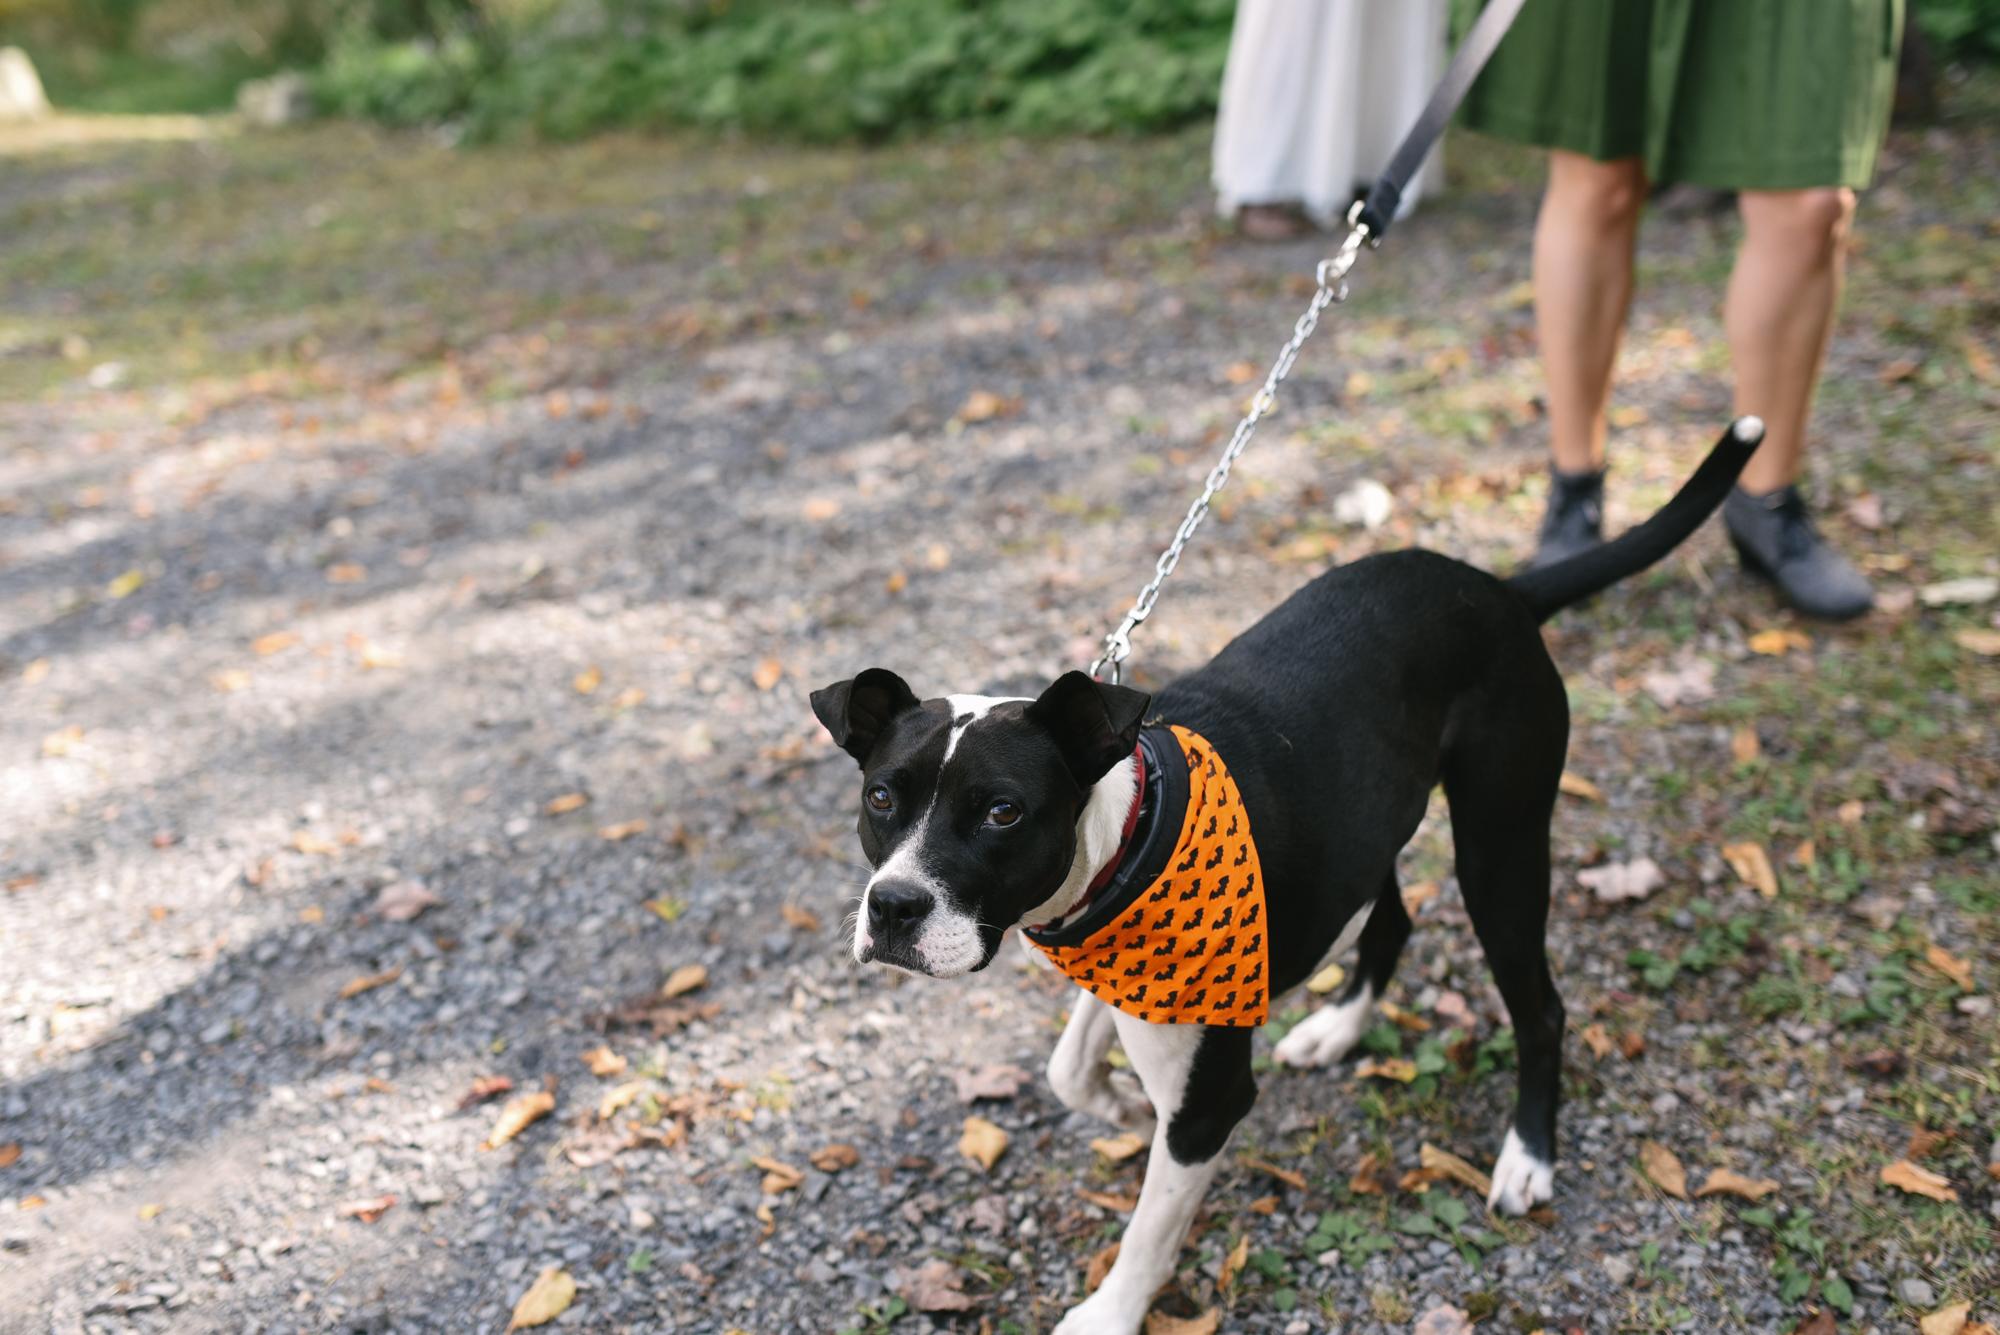 Mountain Wedding, Outdoors, Rustic, West Virginia, Maryland Wedding Photographer, DIY, Casual, Cute dog at wedding, Wedding Guests Pets